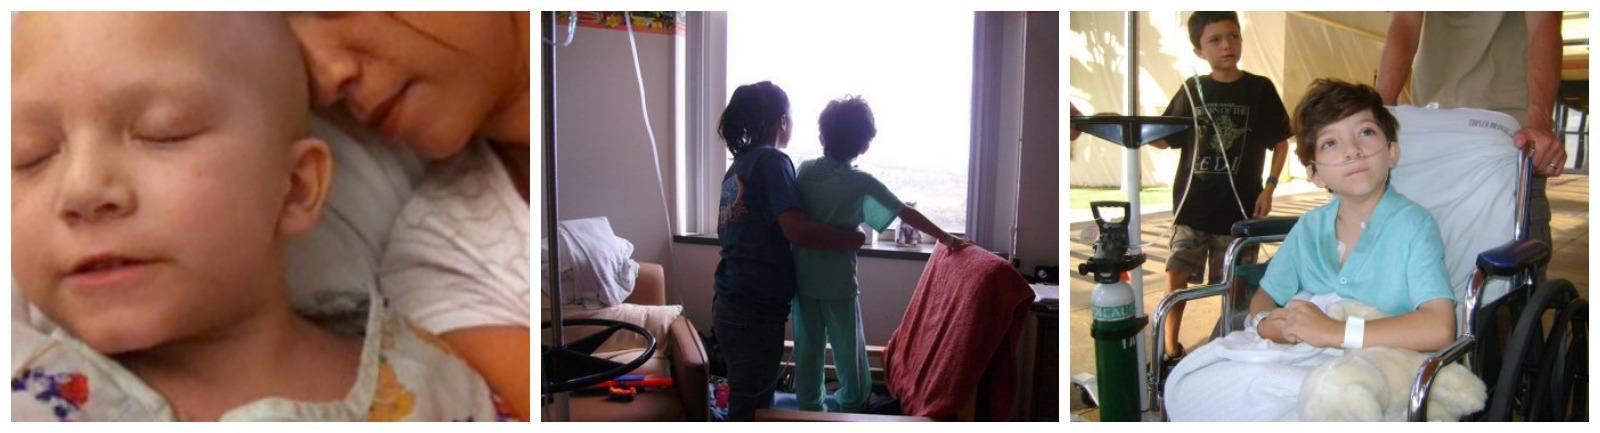 Ryans-last-days-in-the-hospital